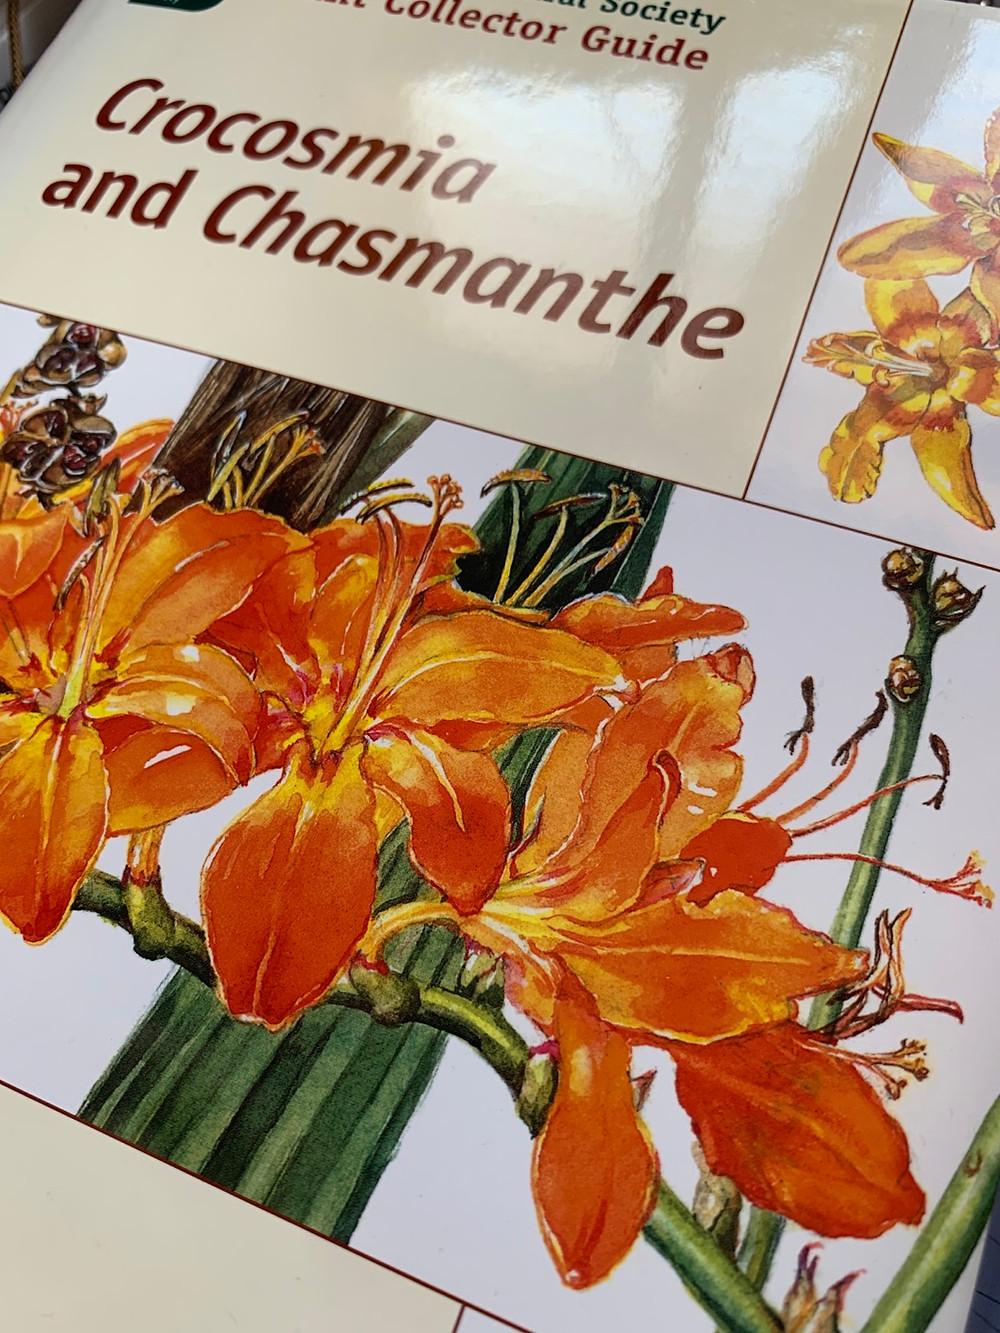 The definitive text on Crocosmia